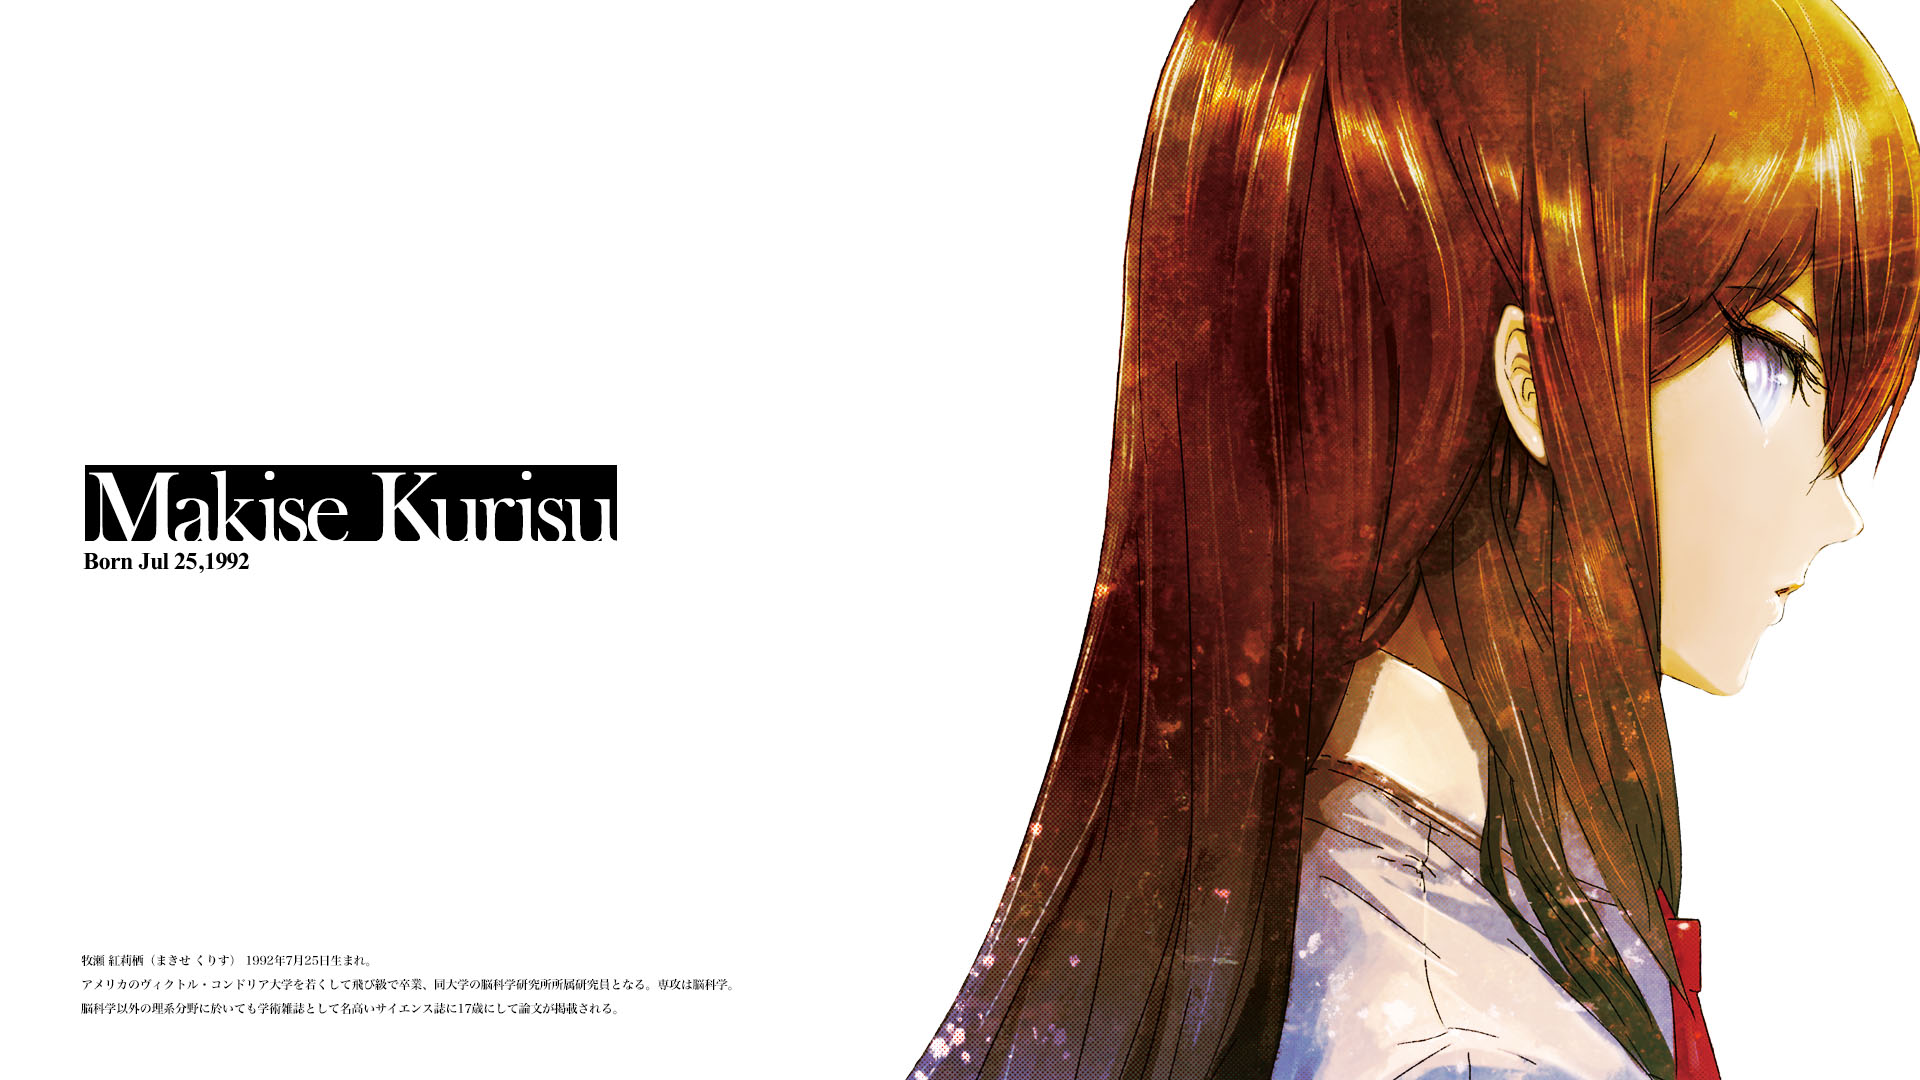 Steins;Gate 0 Makise Kurisu PS Vita PS3 PS4